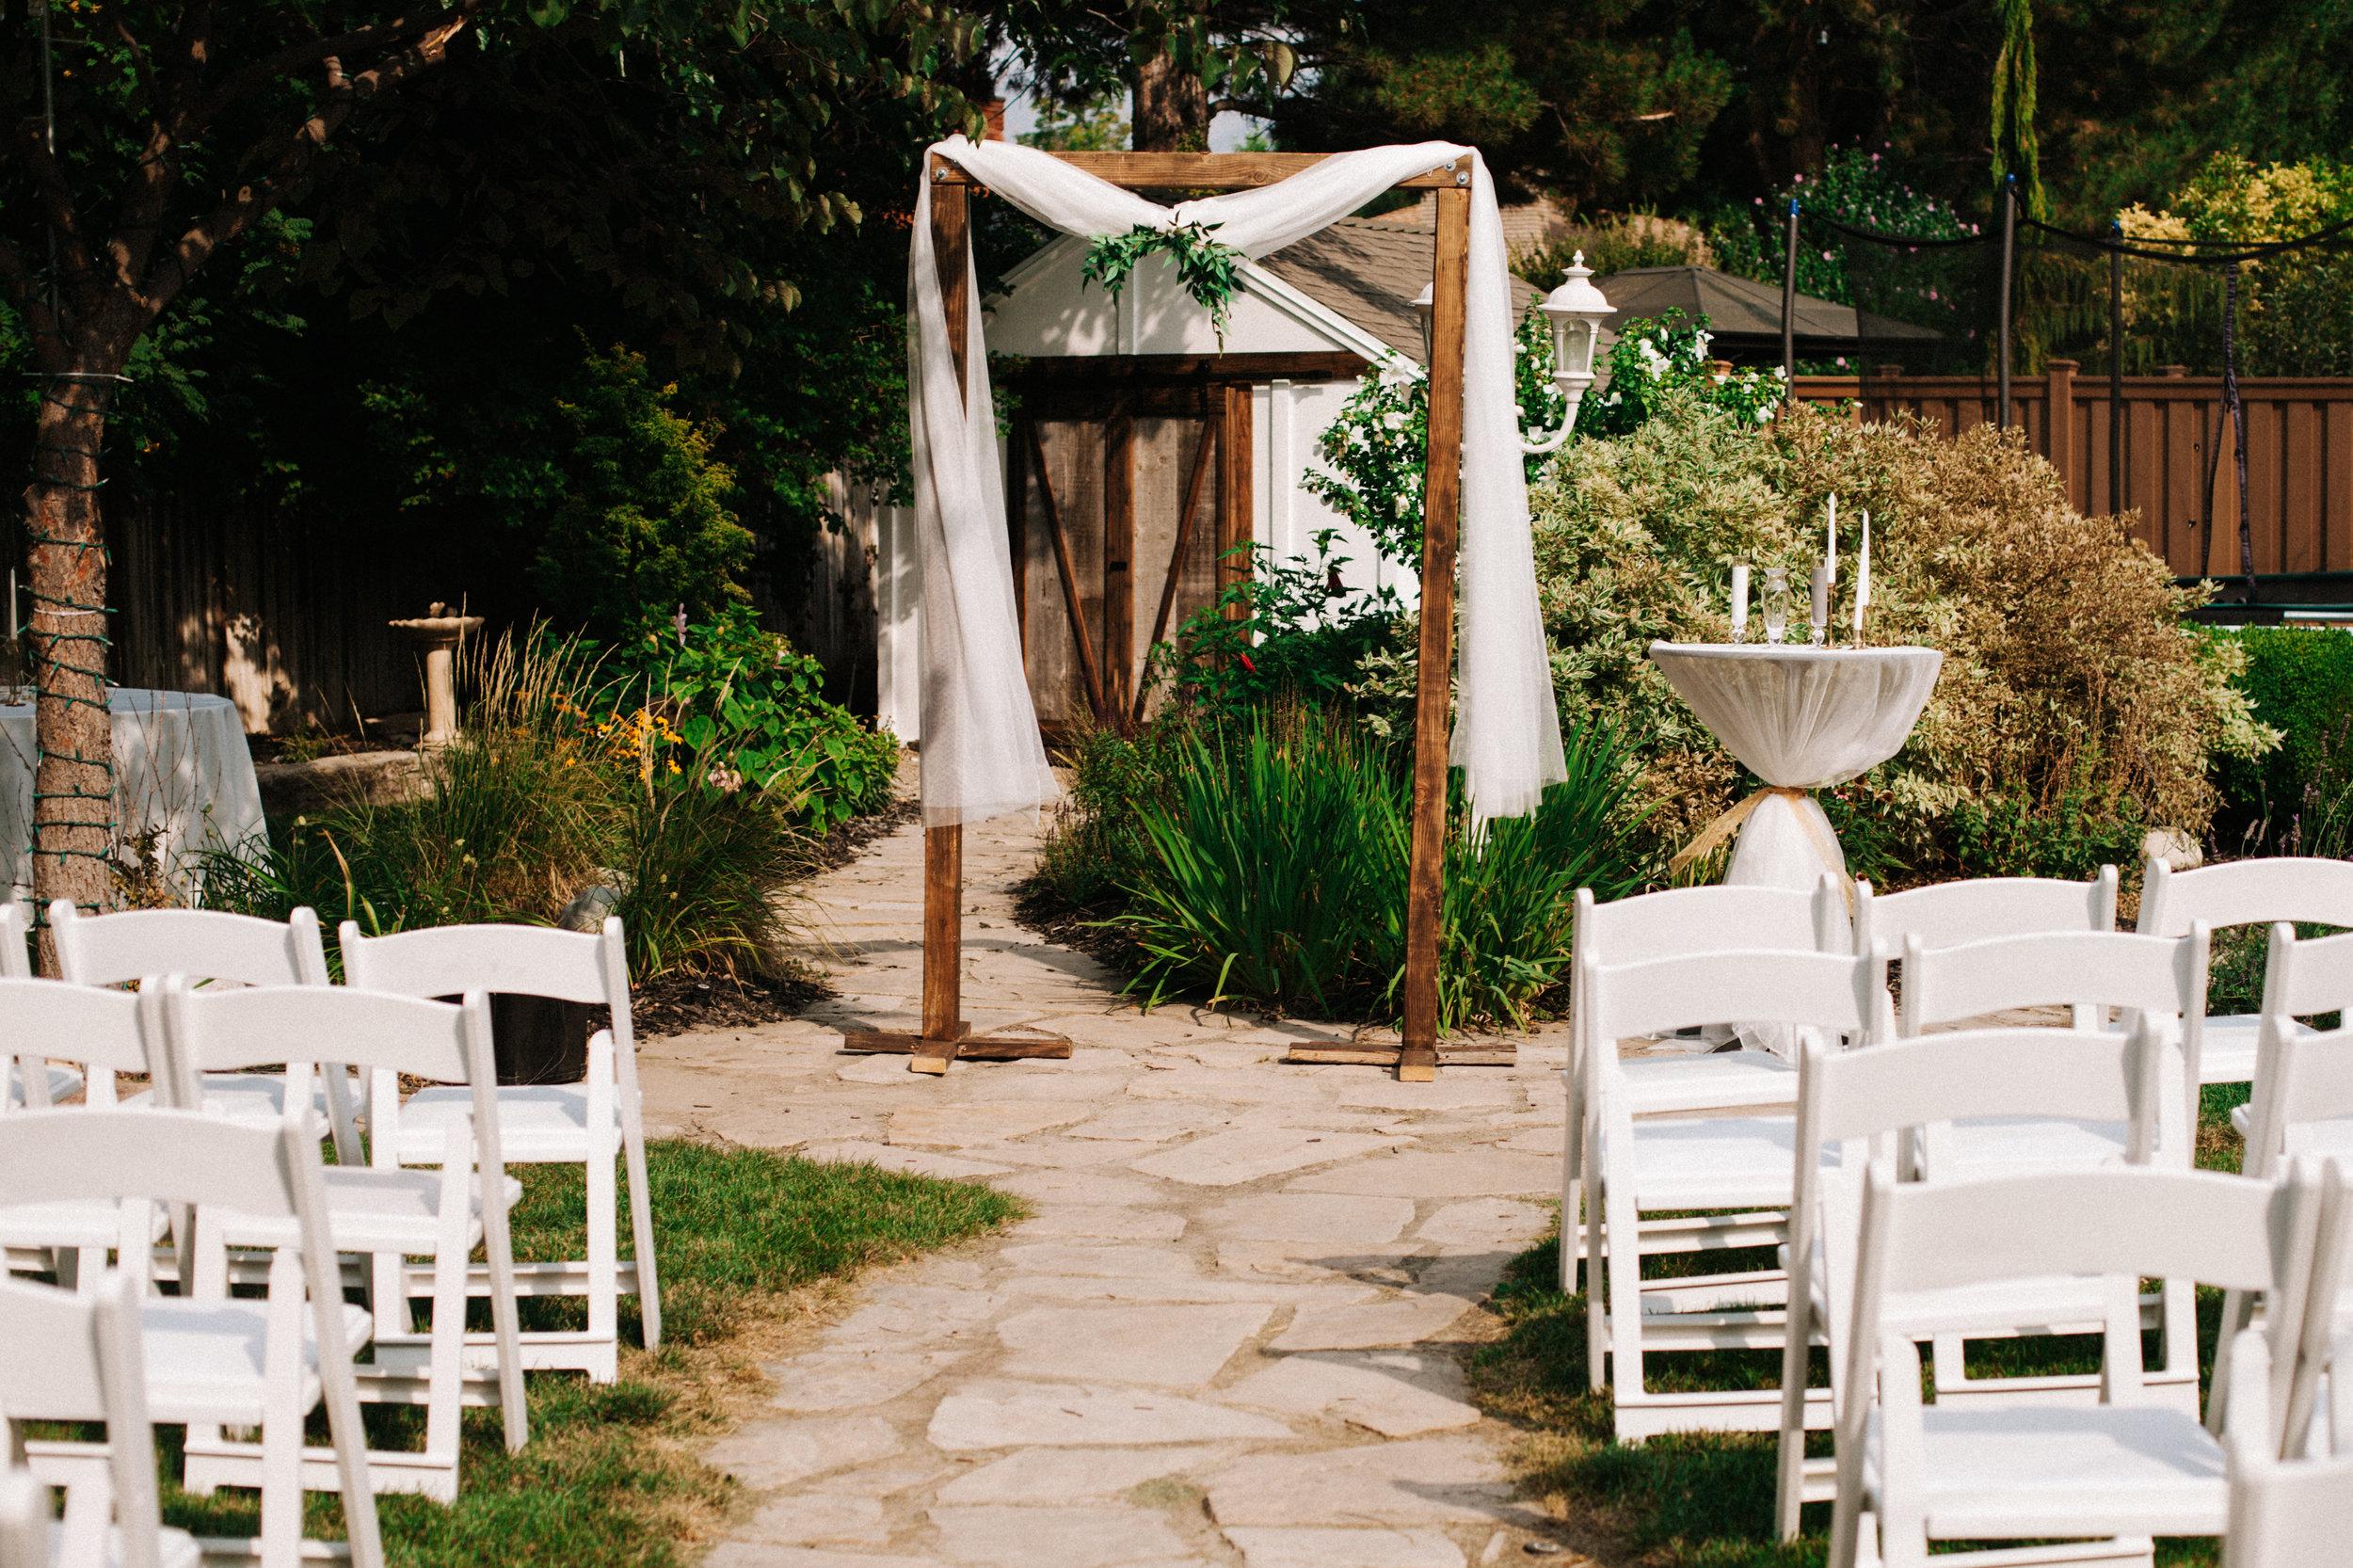 Wedding altar, wedding ceremony inspiration, backyard wedding inspiration, Salt Lake City wedding, Salt lake city wedding photographer, Utah wedding, Utah wedding photographer